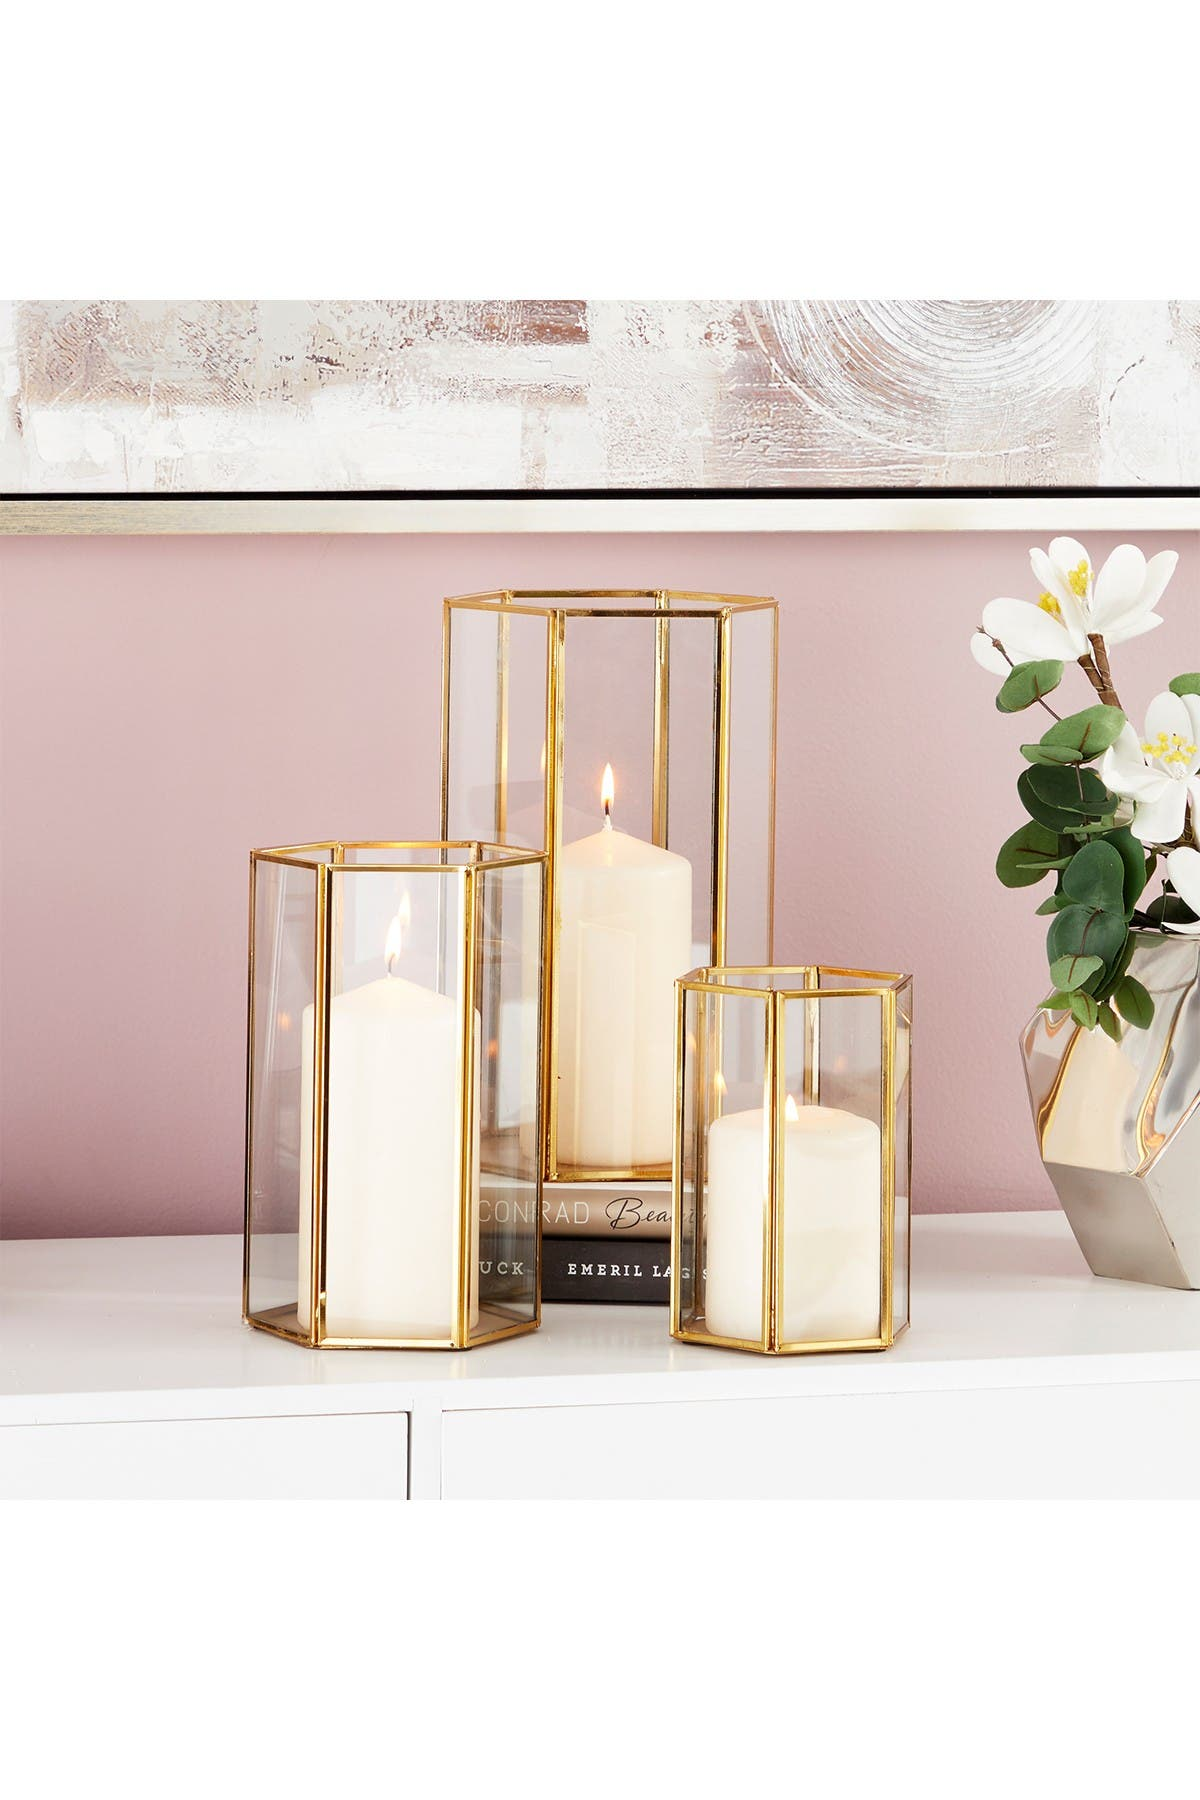 Cosmoliving By Cosmopolitan Modern Hexagonal Prism Shaped Iron Glass Candle Lantern Set Of 3 Nordstrom Rack